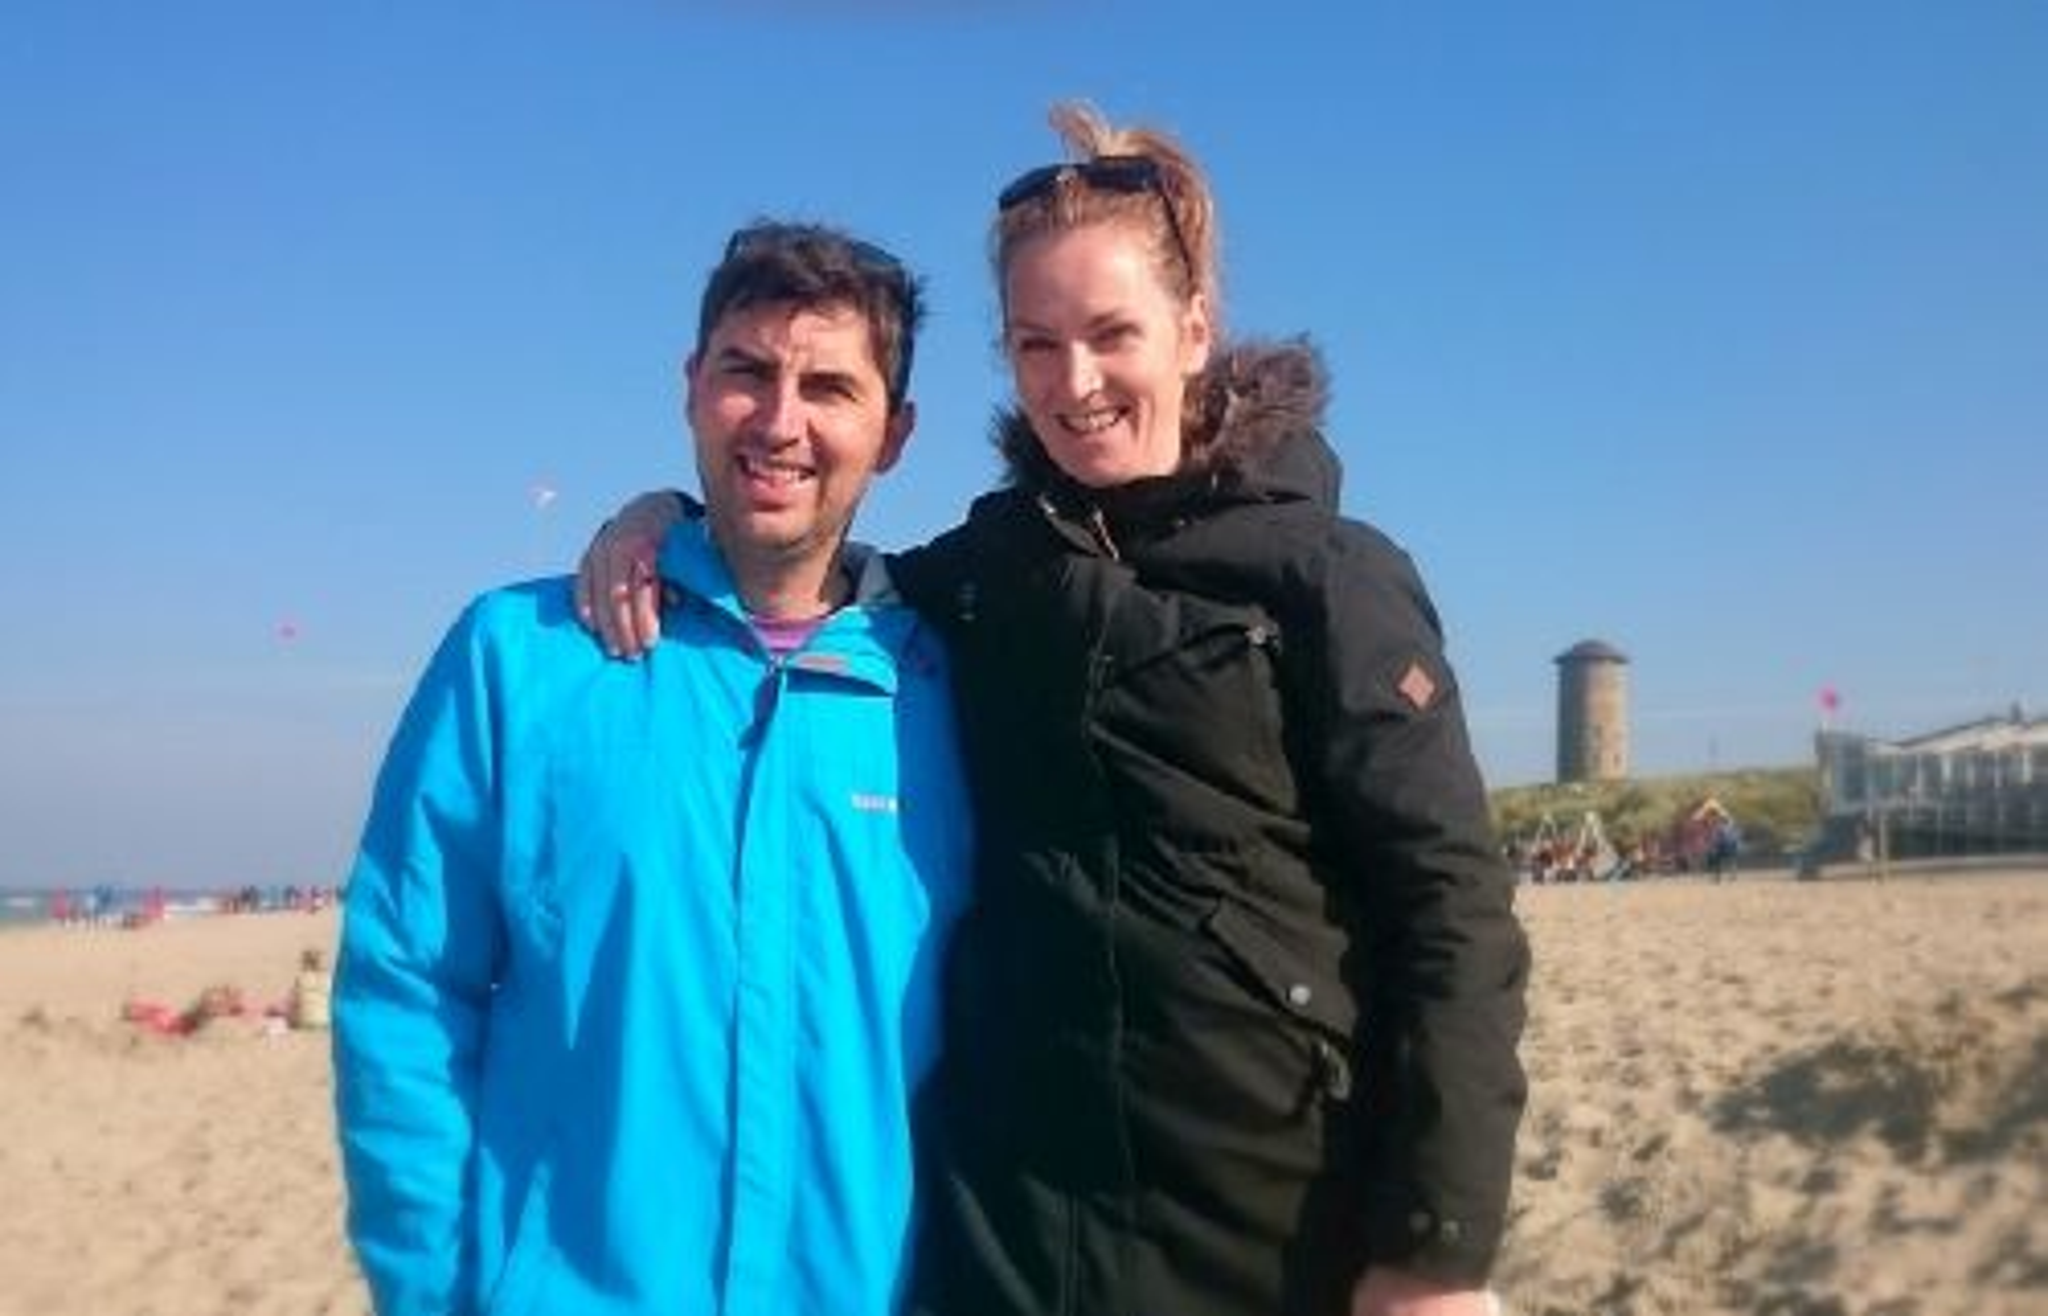 Martijn de Roos und Marjolein Minderhoud